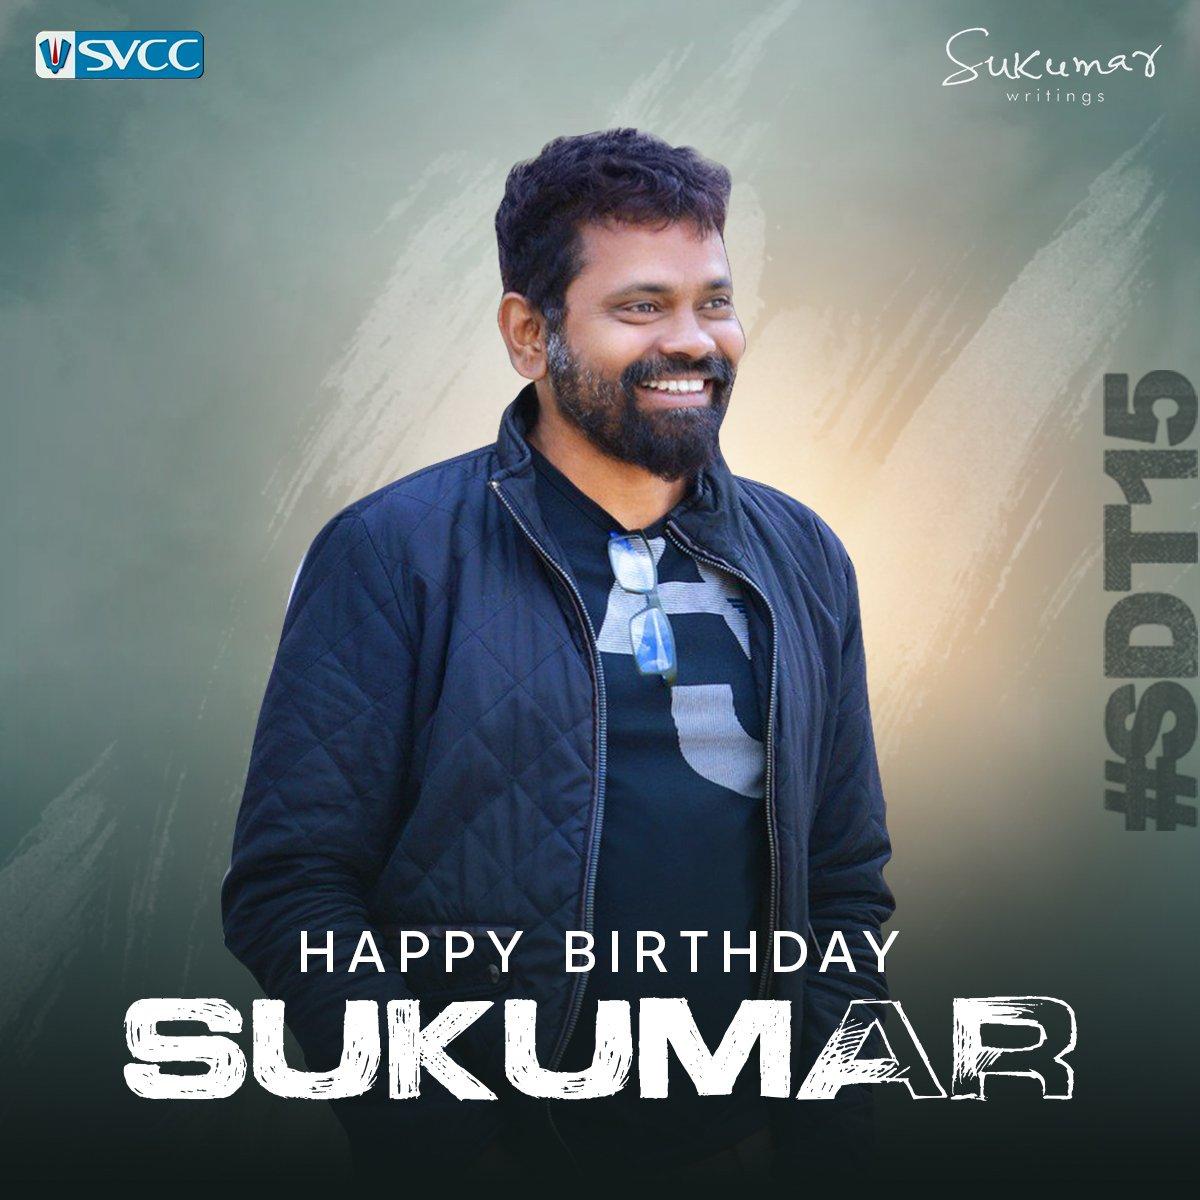 Wishing our Very Own Creative Director @aryasukku garu a very Happy Birthday 🤗. Keep inspiring us like always you do! #HBDSukumar  #Sukumar #SDT15 @SukumarWritings